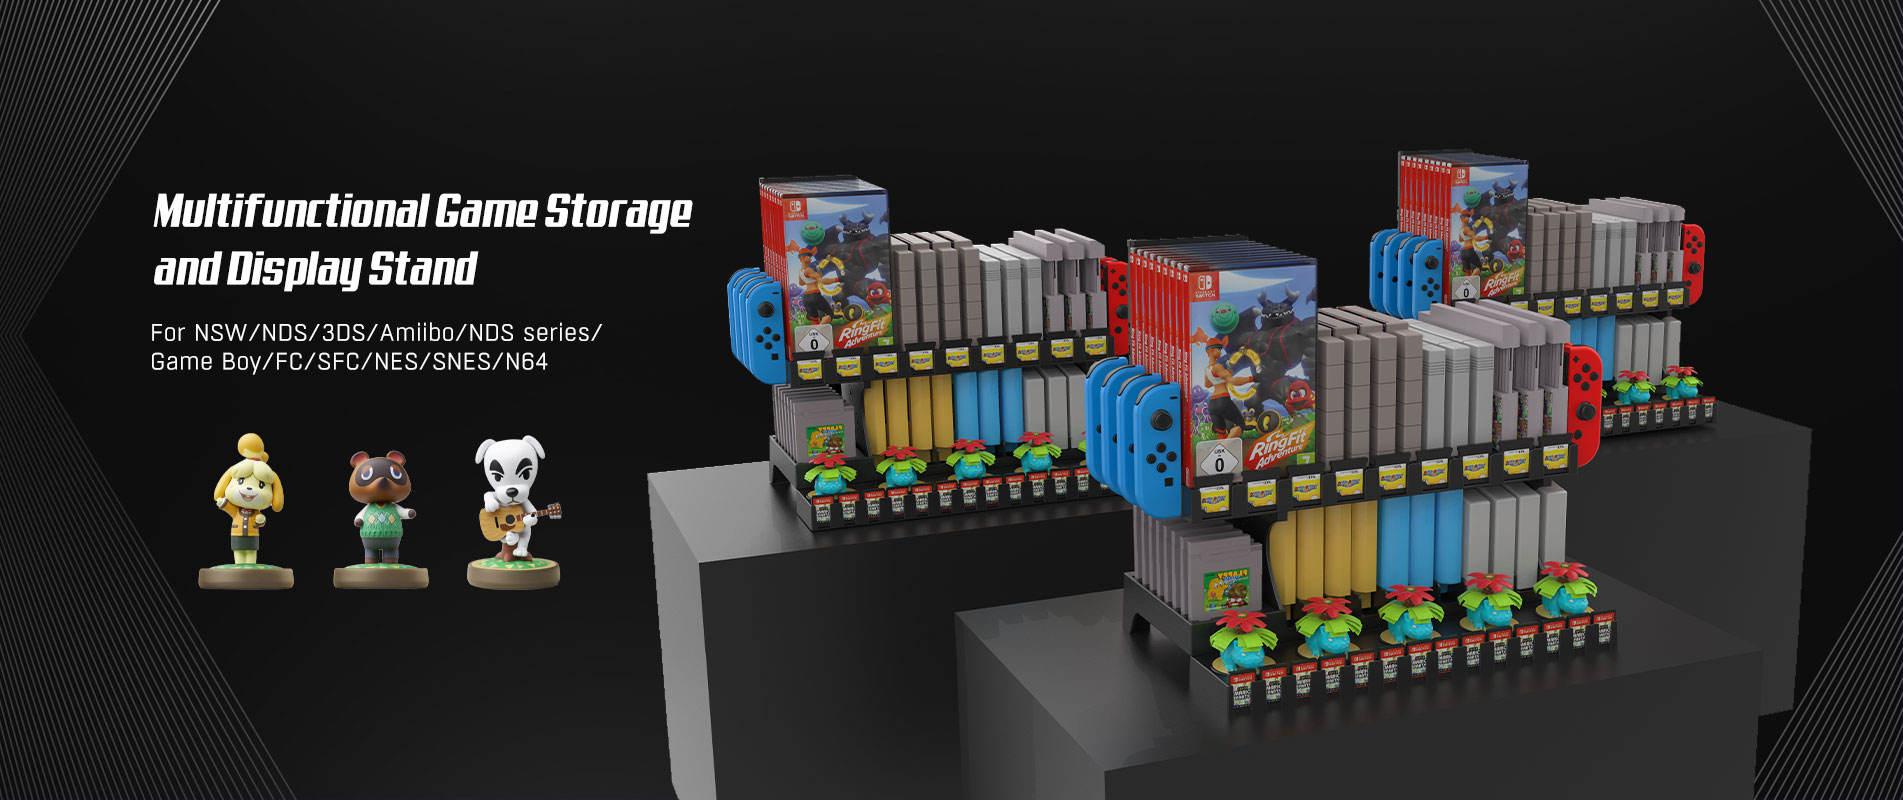 nintendo classic games storage stand